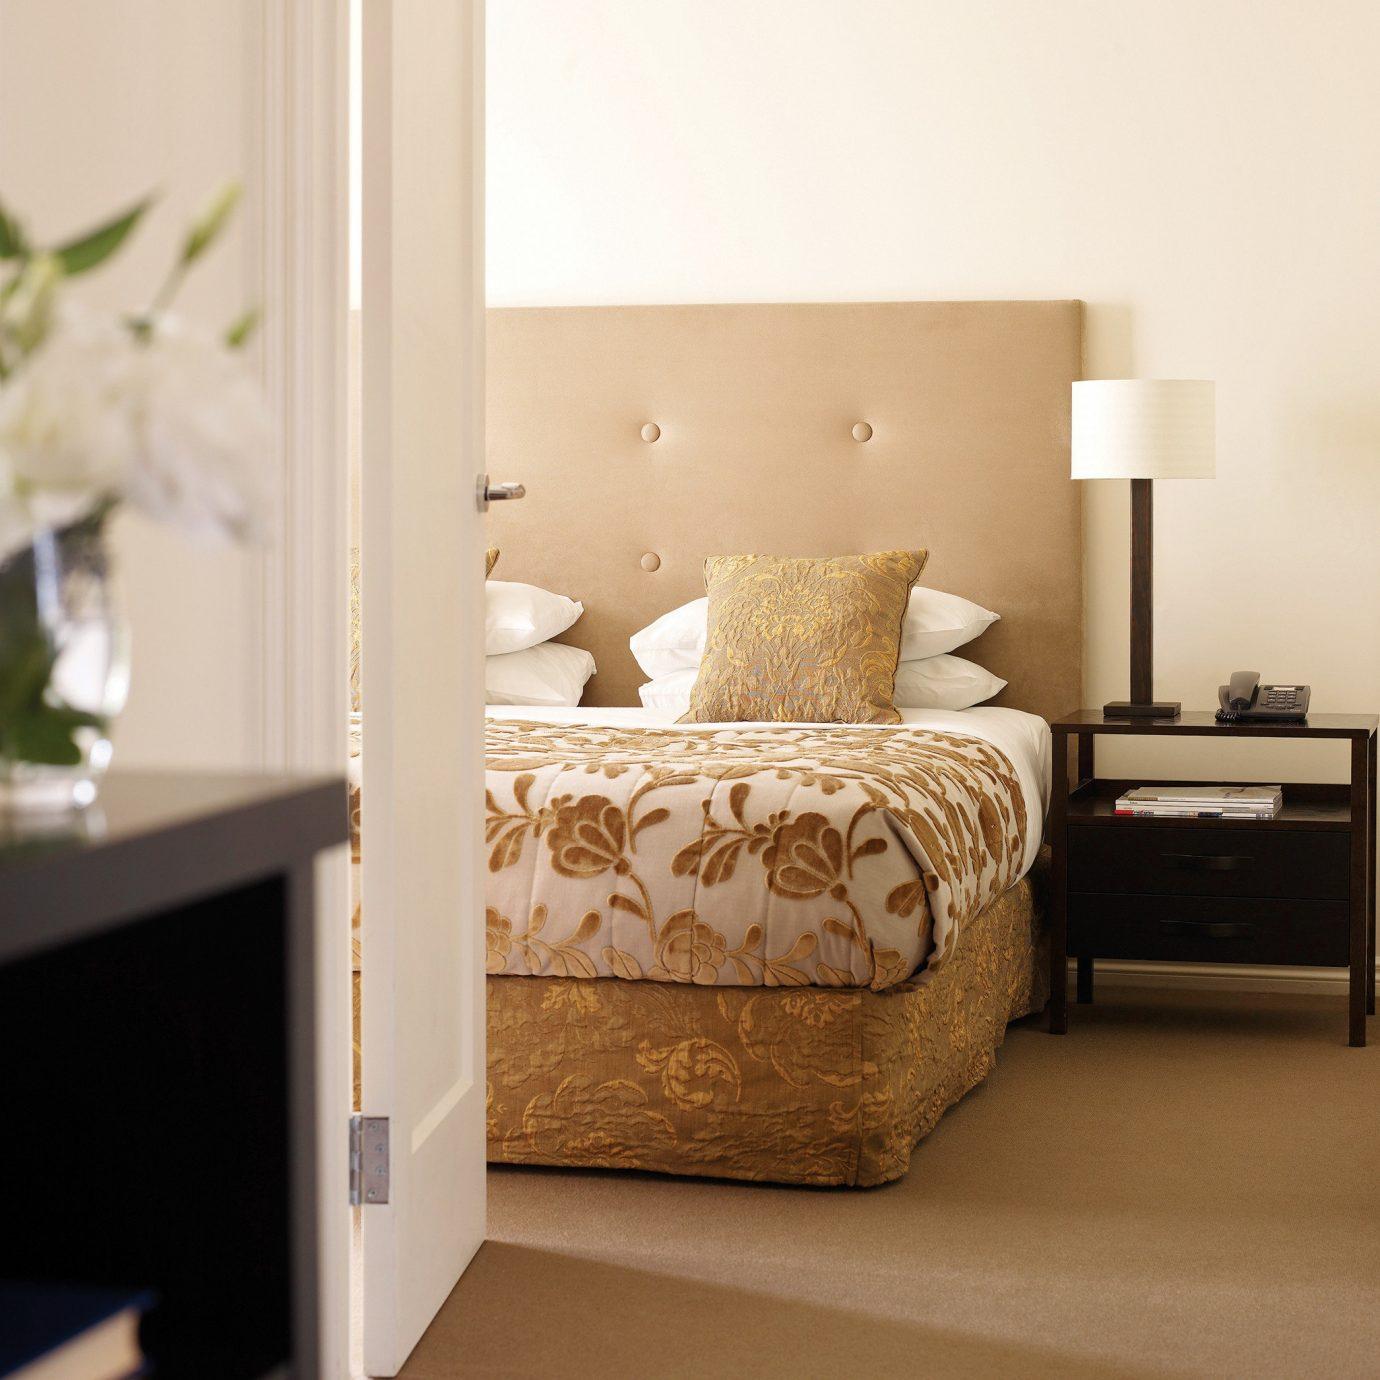 Bedroom Elegant Luxury Suite living room home bed sheet bed frame studio couch flooring